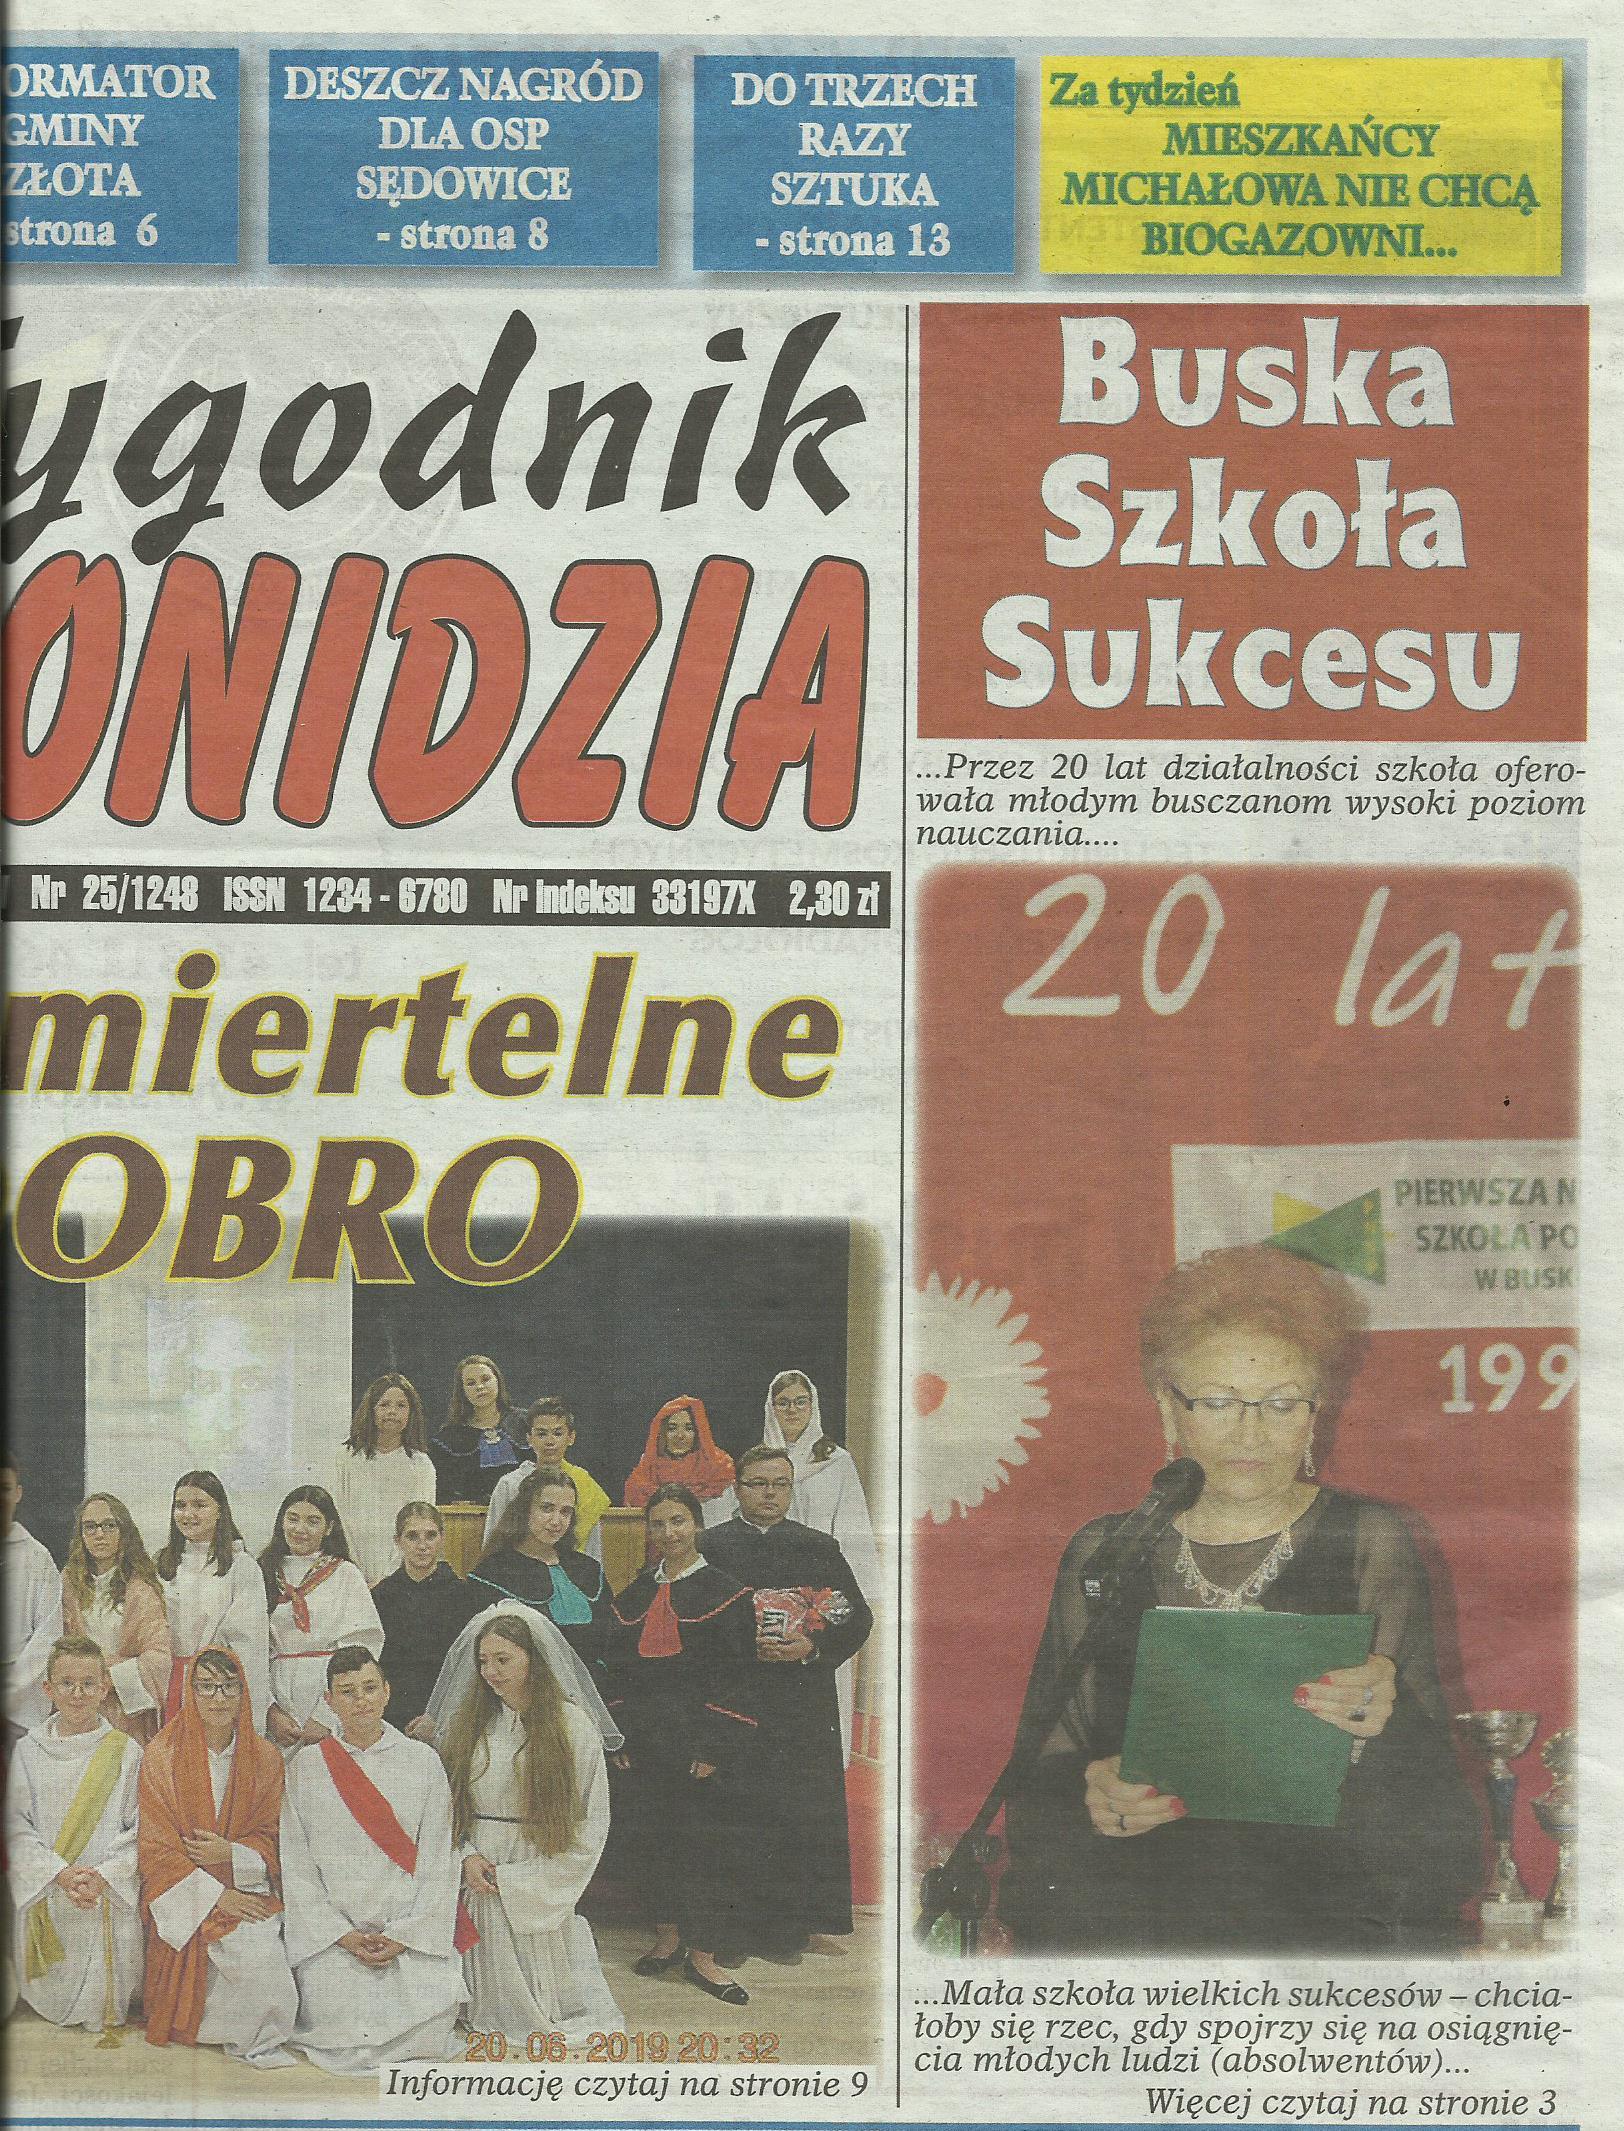 BUSKA_SZKOLA_SUKCESU0001.jpg